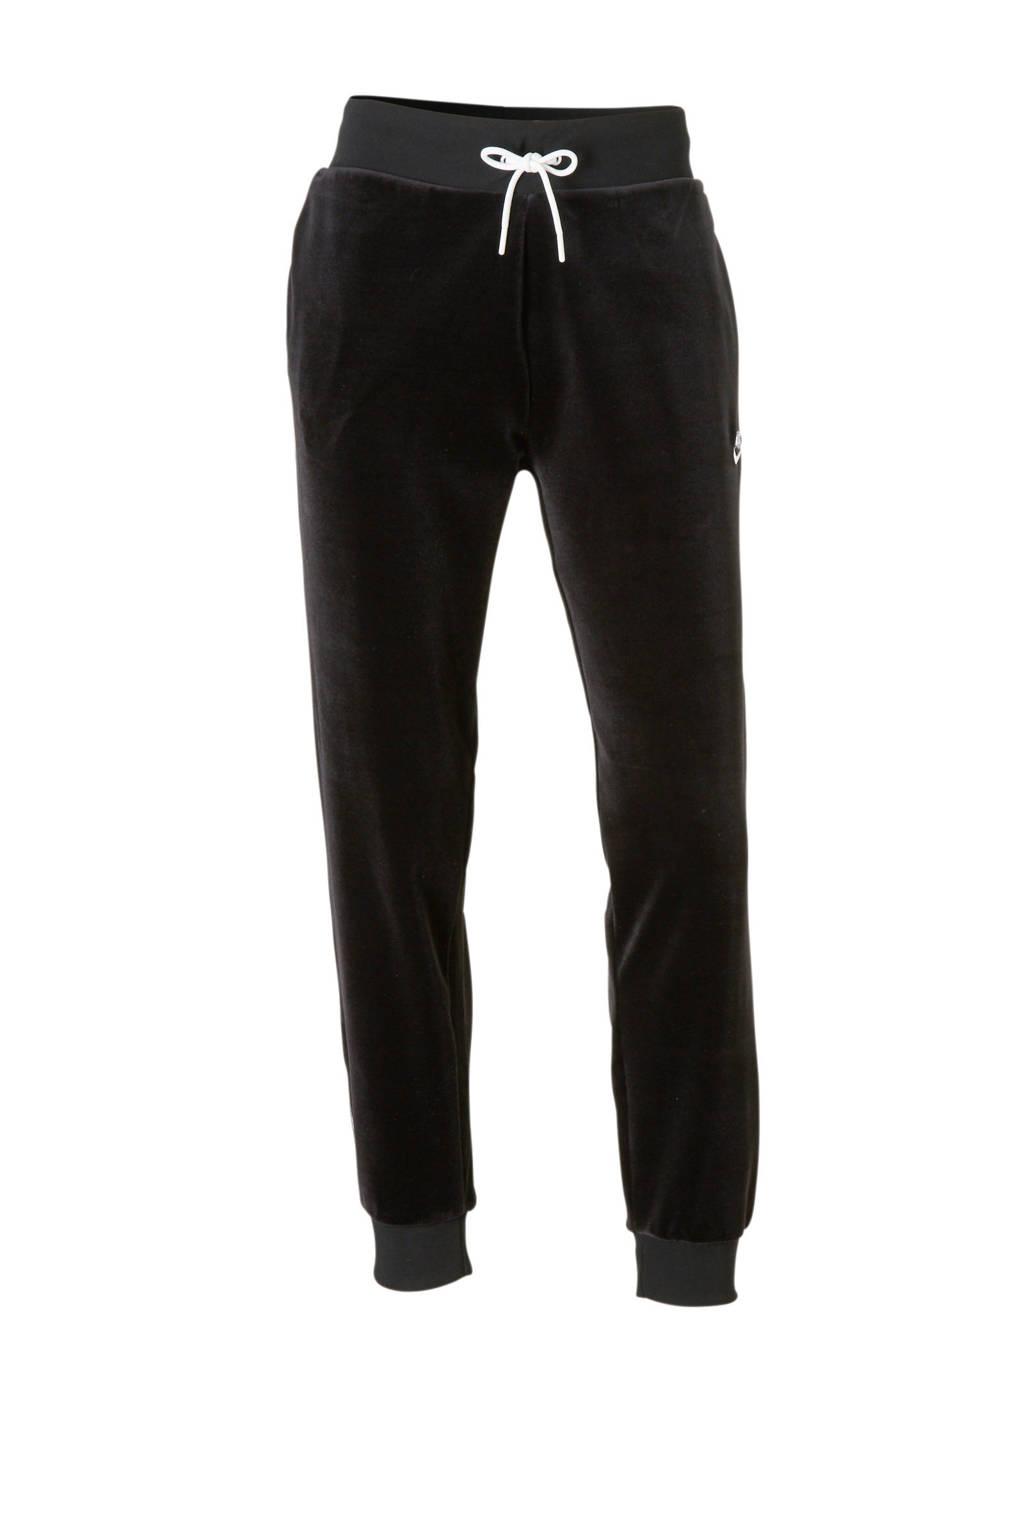 Nike sportbroek zwart, Zwart